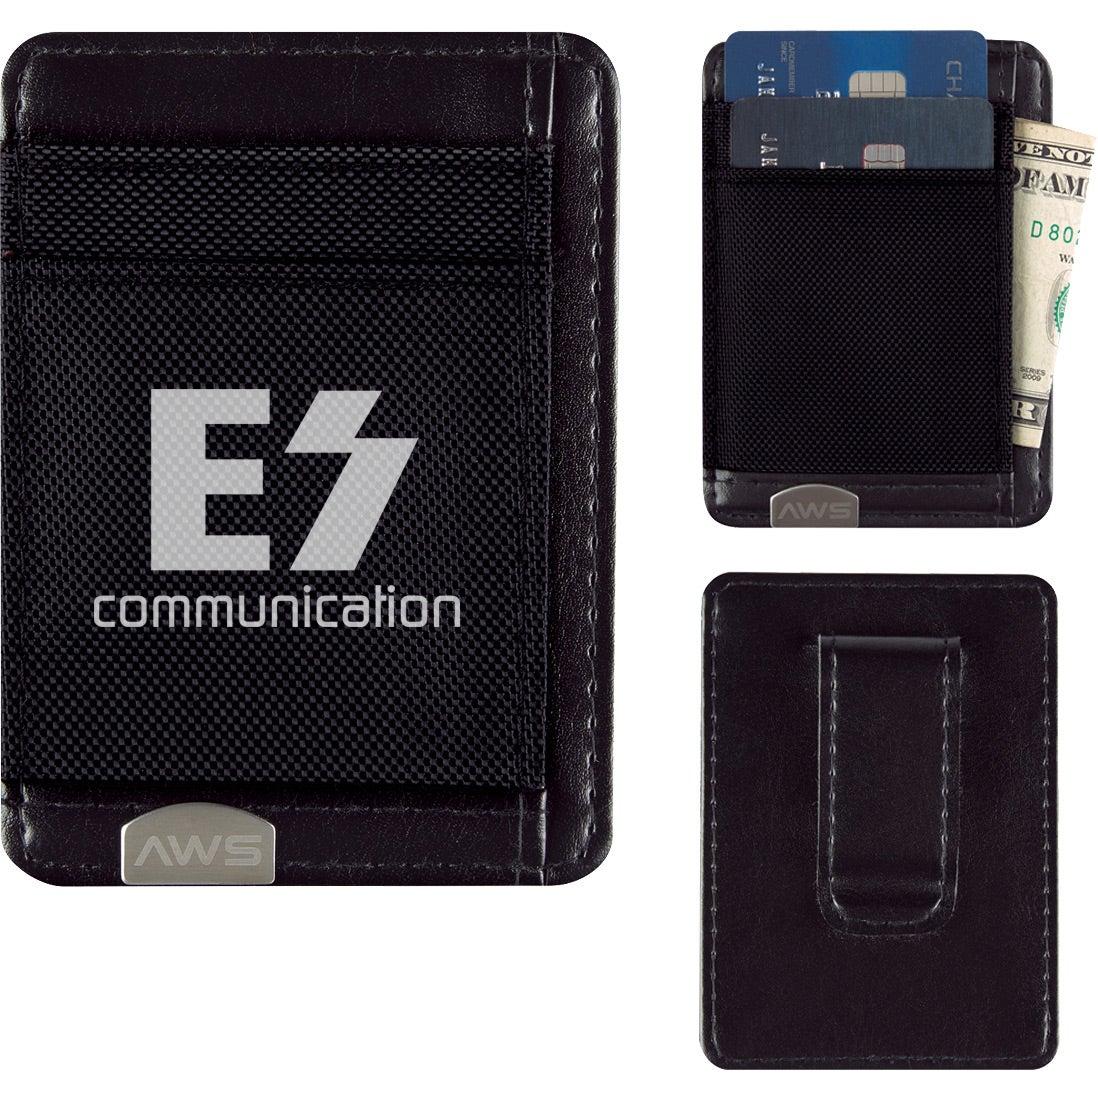 black executive rfid money clip card holder branded - Money Clip Card Holder